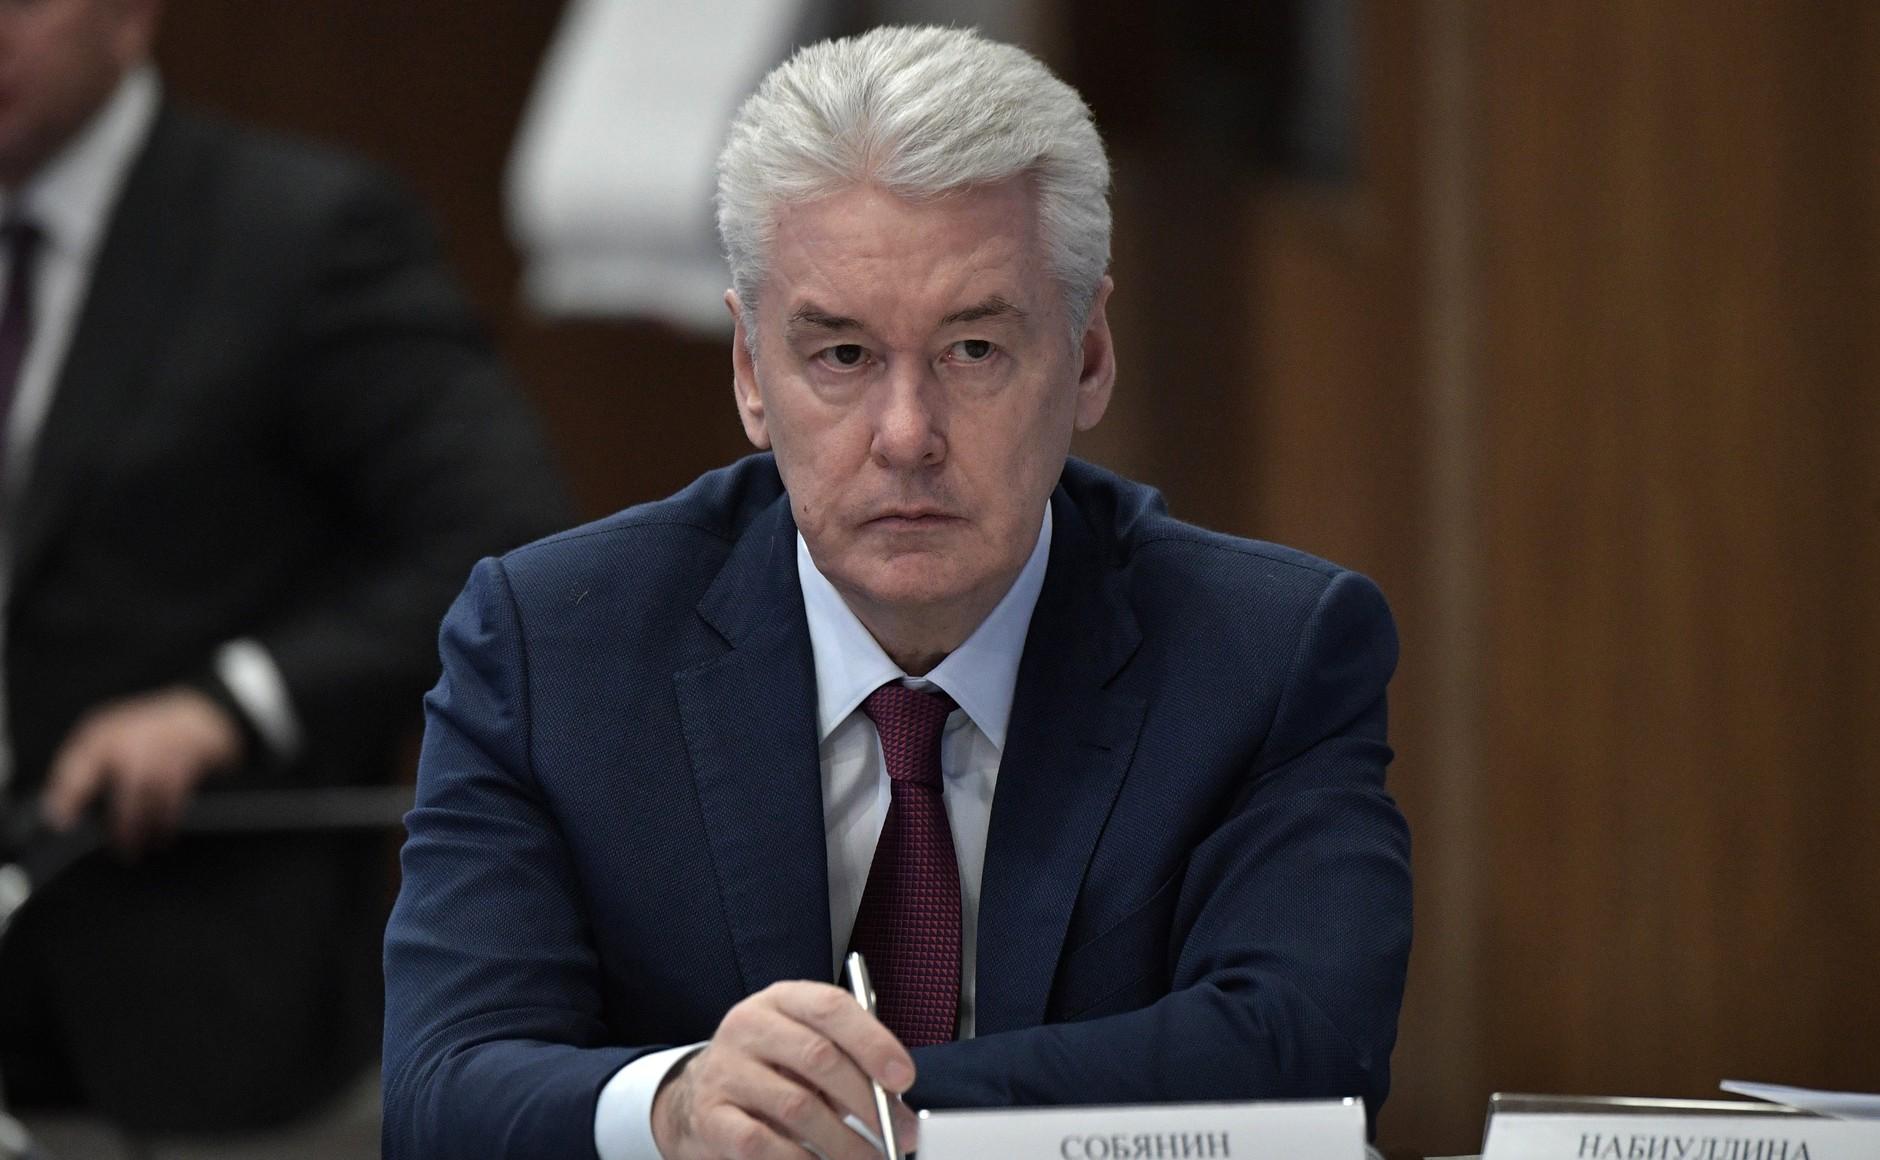 <p>Сергей Собянин. Фото © Пресс-служба Президента РФ</p>